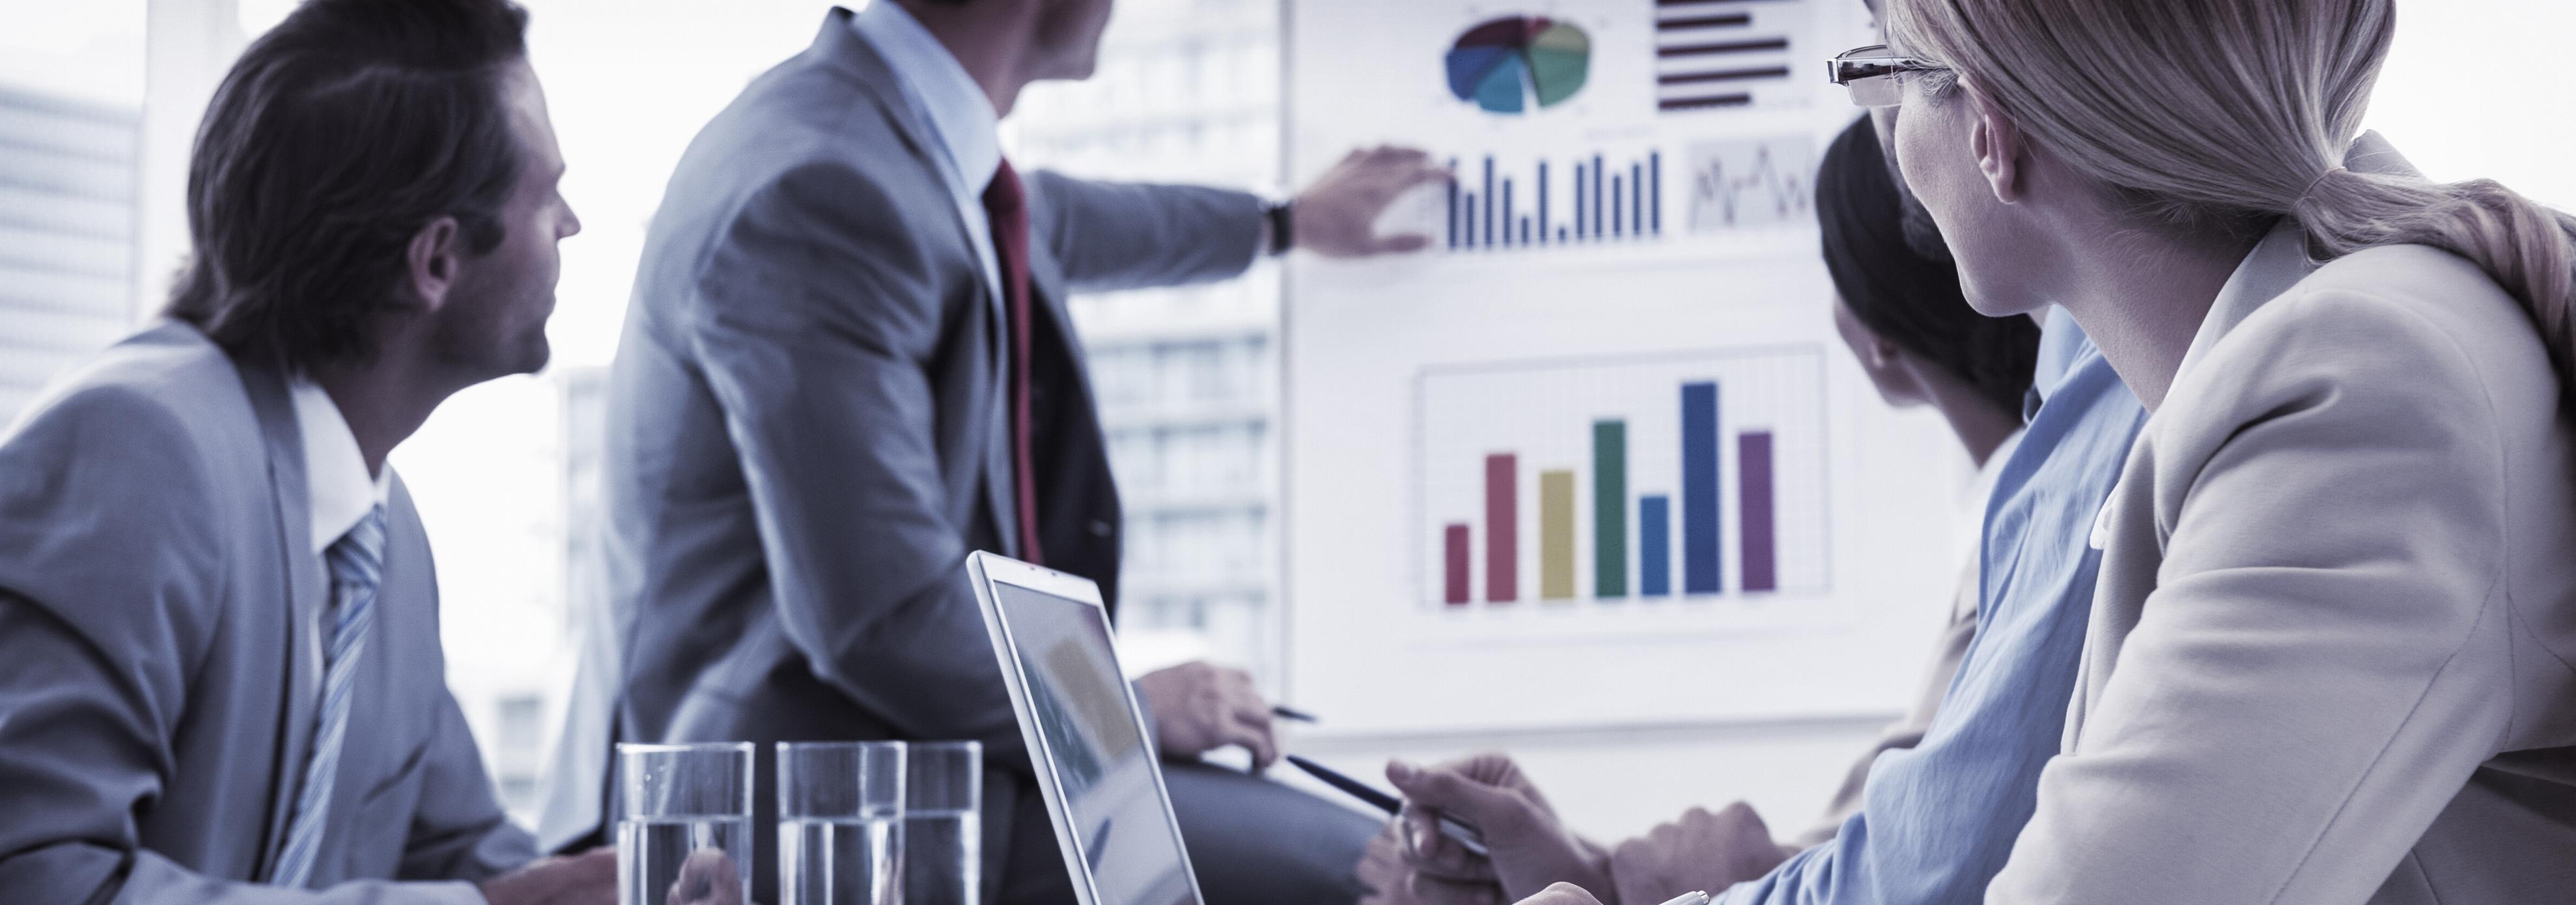 small-cap investment community